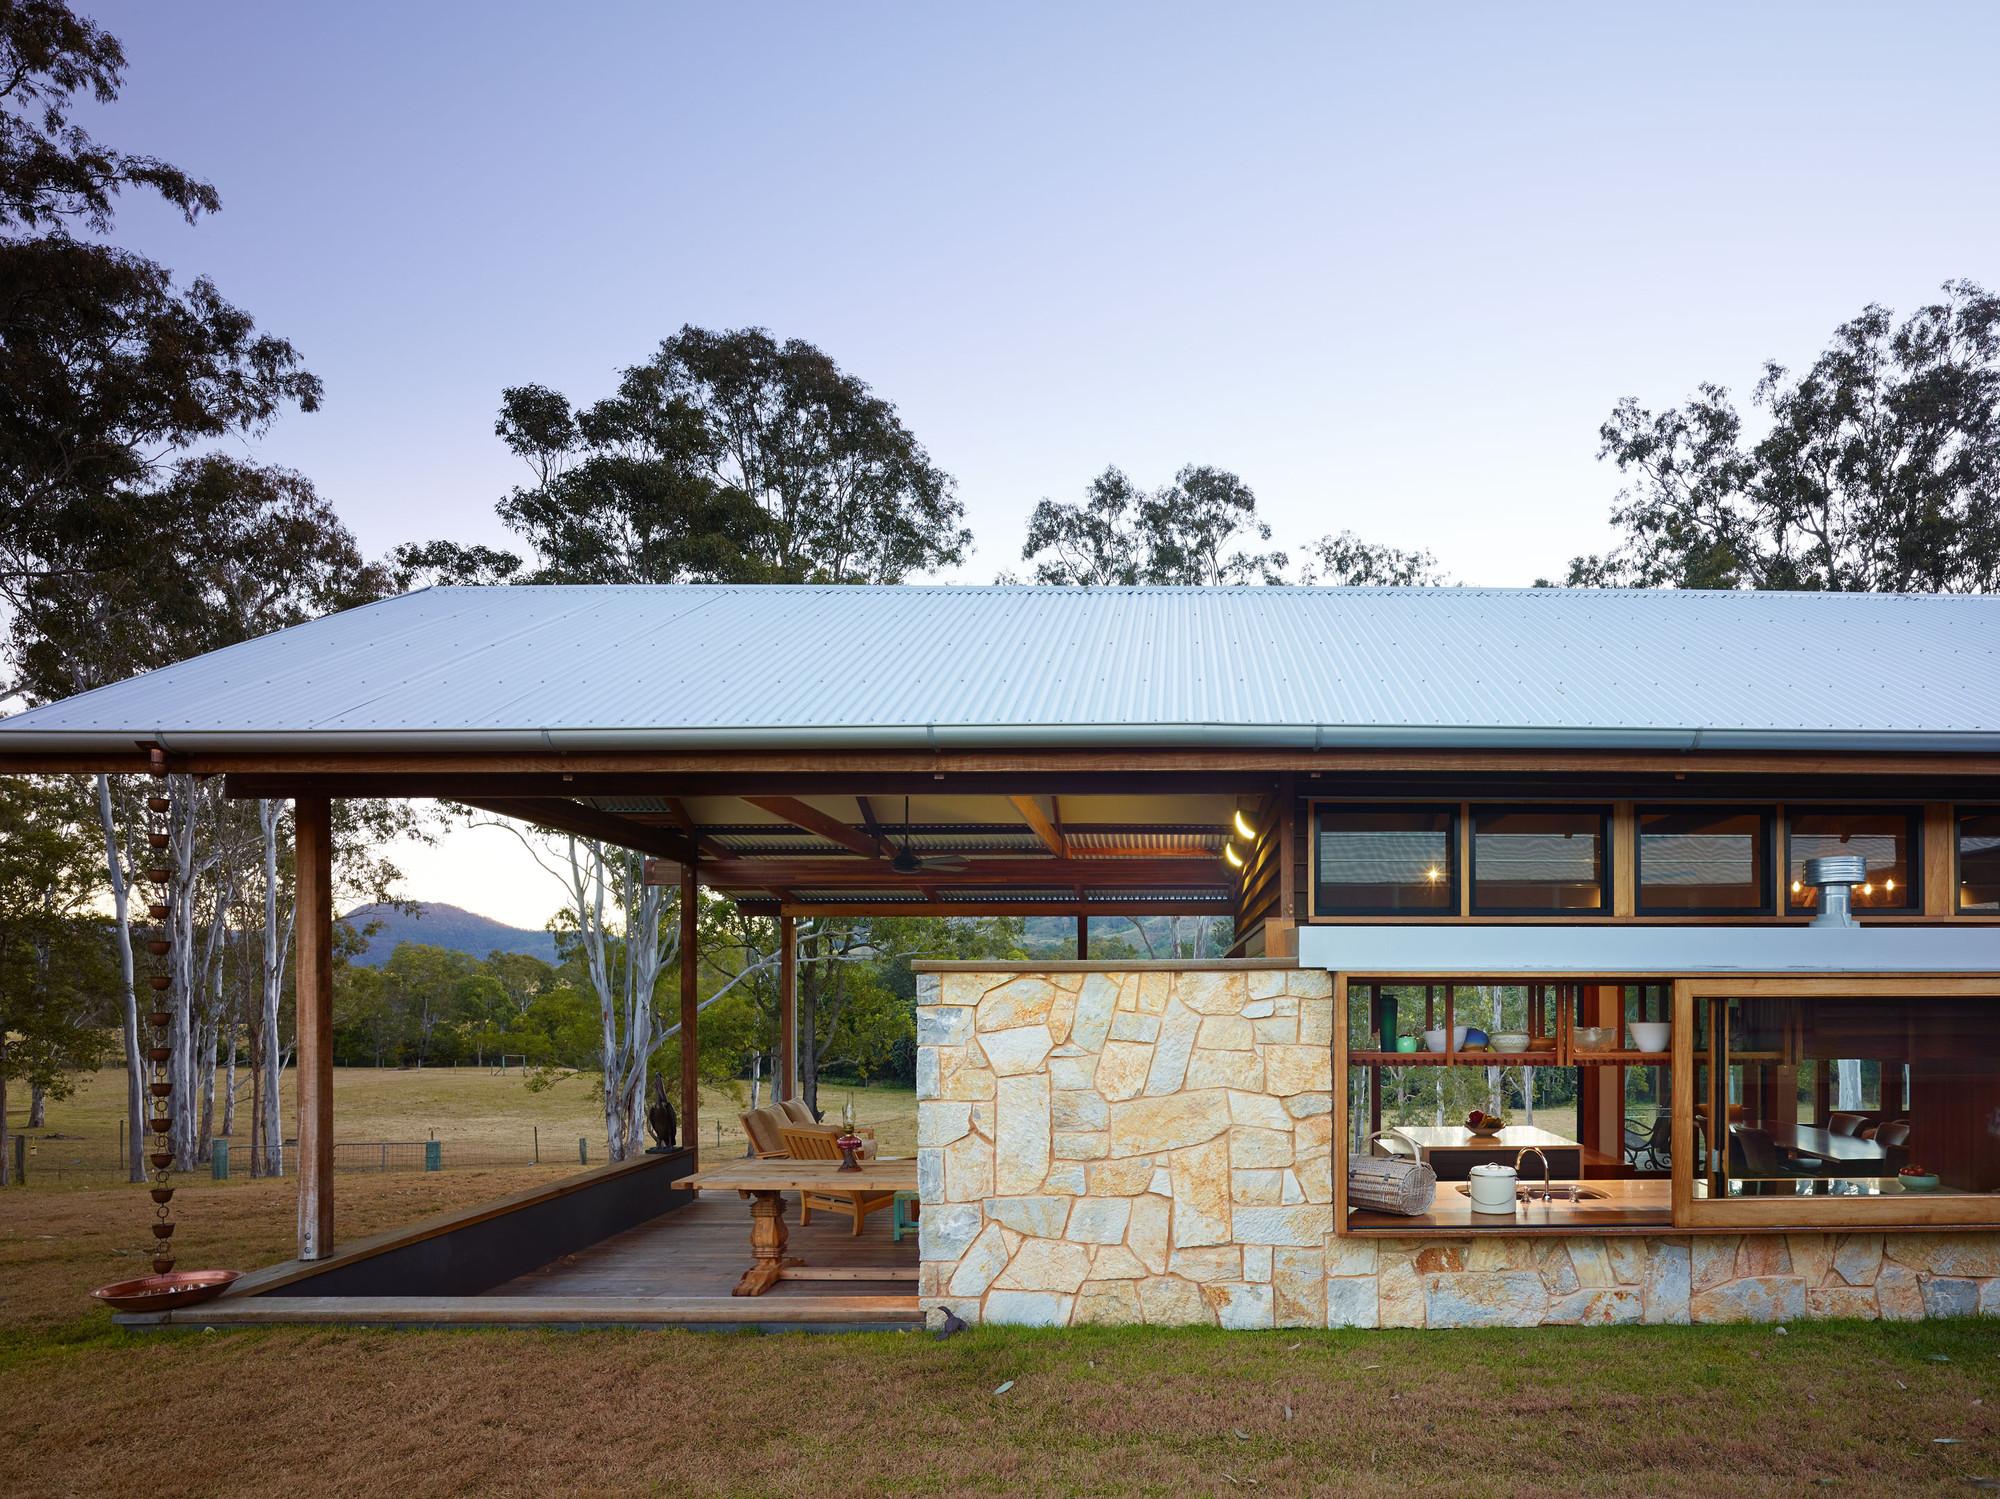 Casa hinterland shaun lockyer architects plataforma for Bush house designs